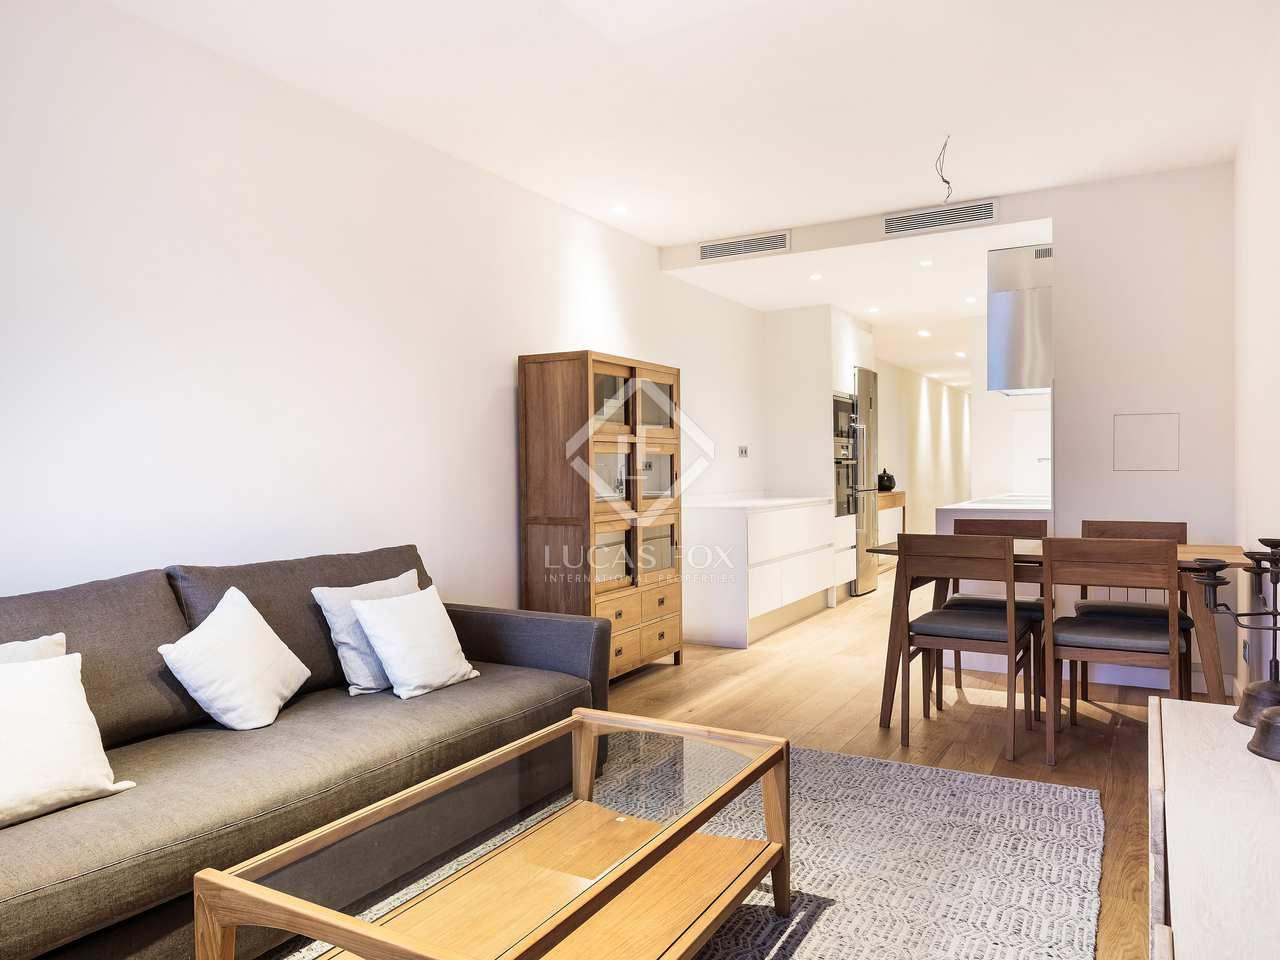 Piso de 87m con terraza de 50m en venta en eixample derecho for Decoracion piso eixample